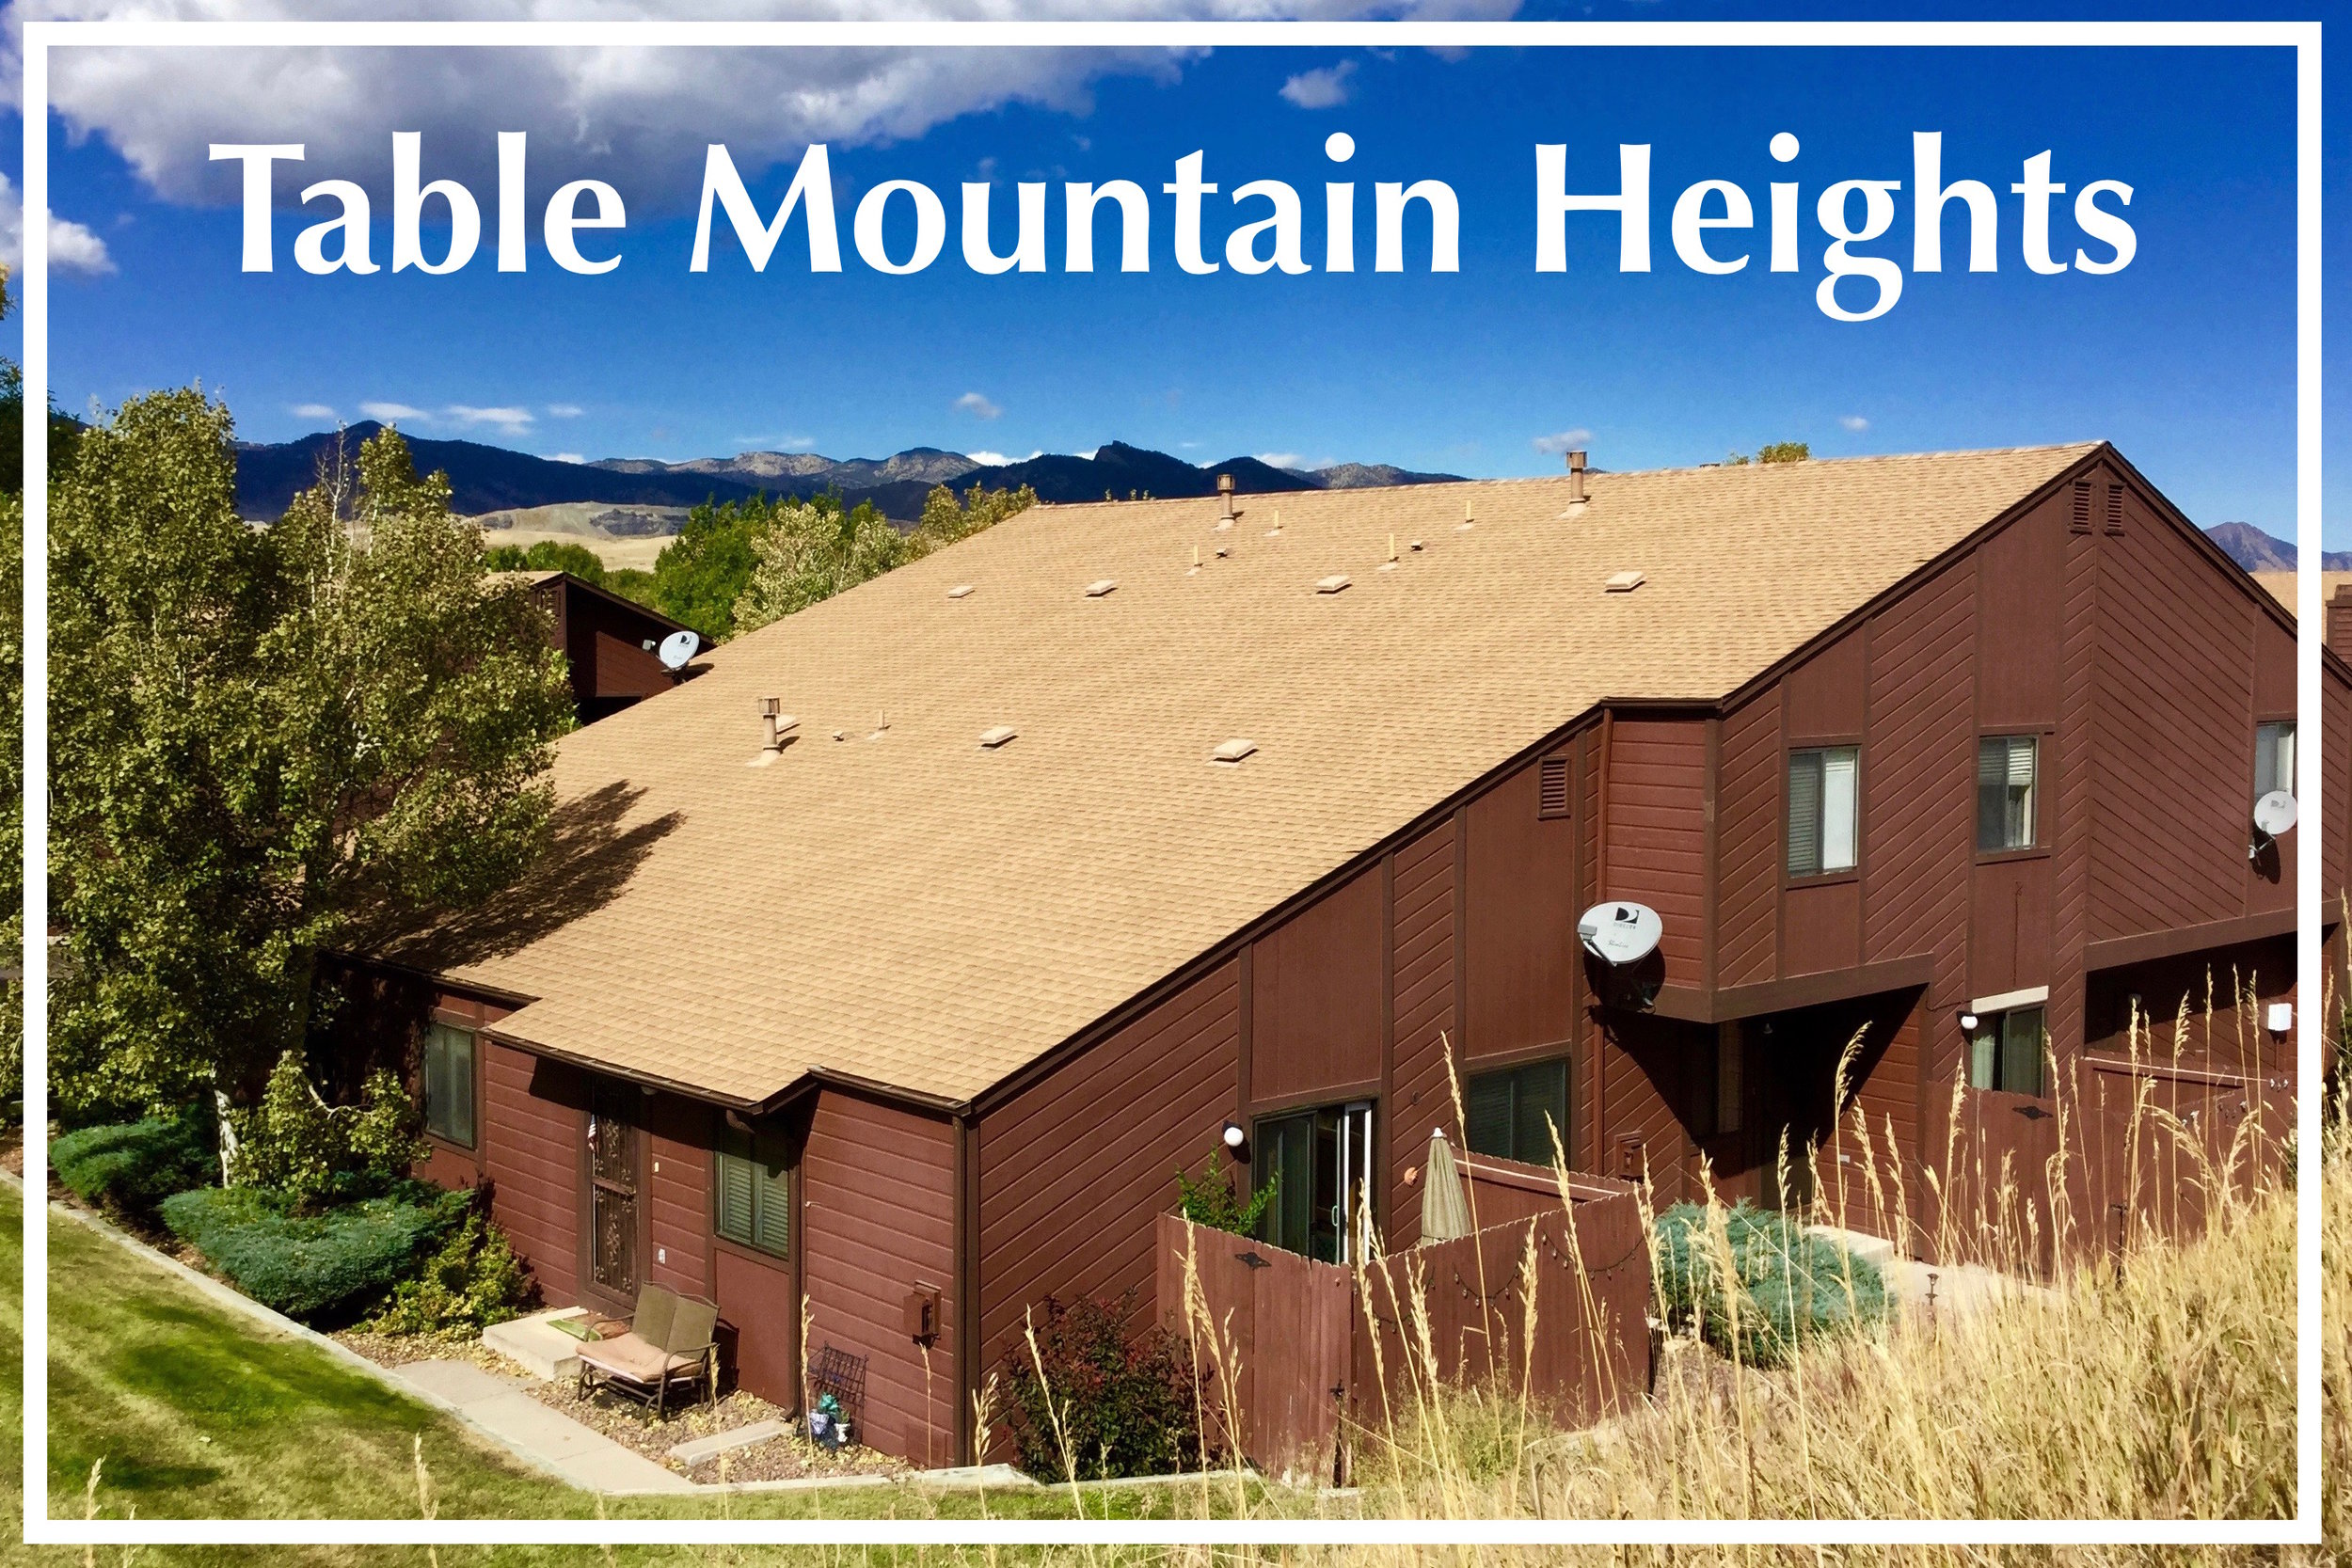 Table Mountain Heights.jpg